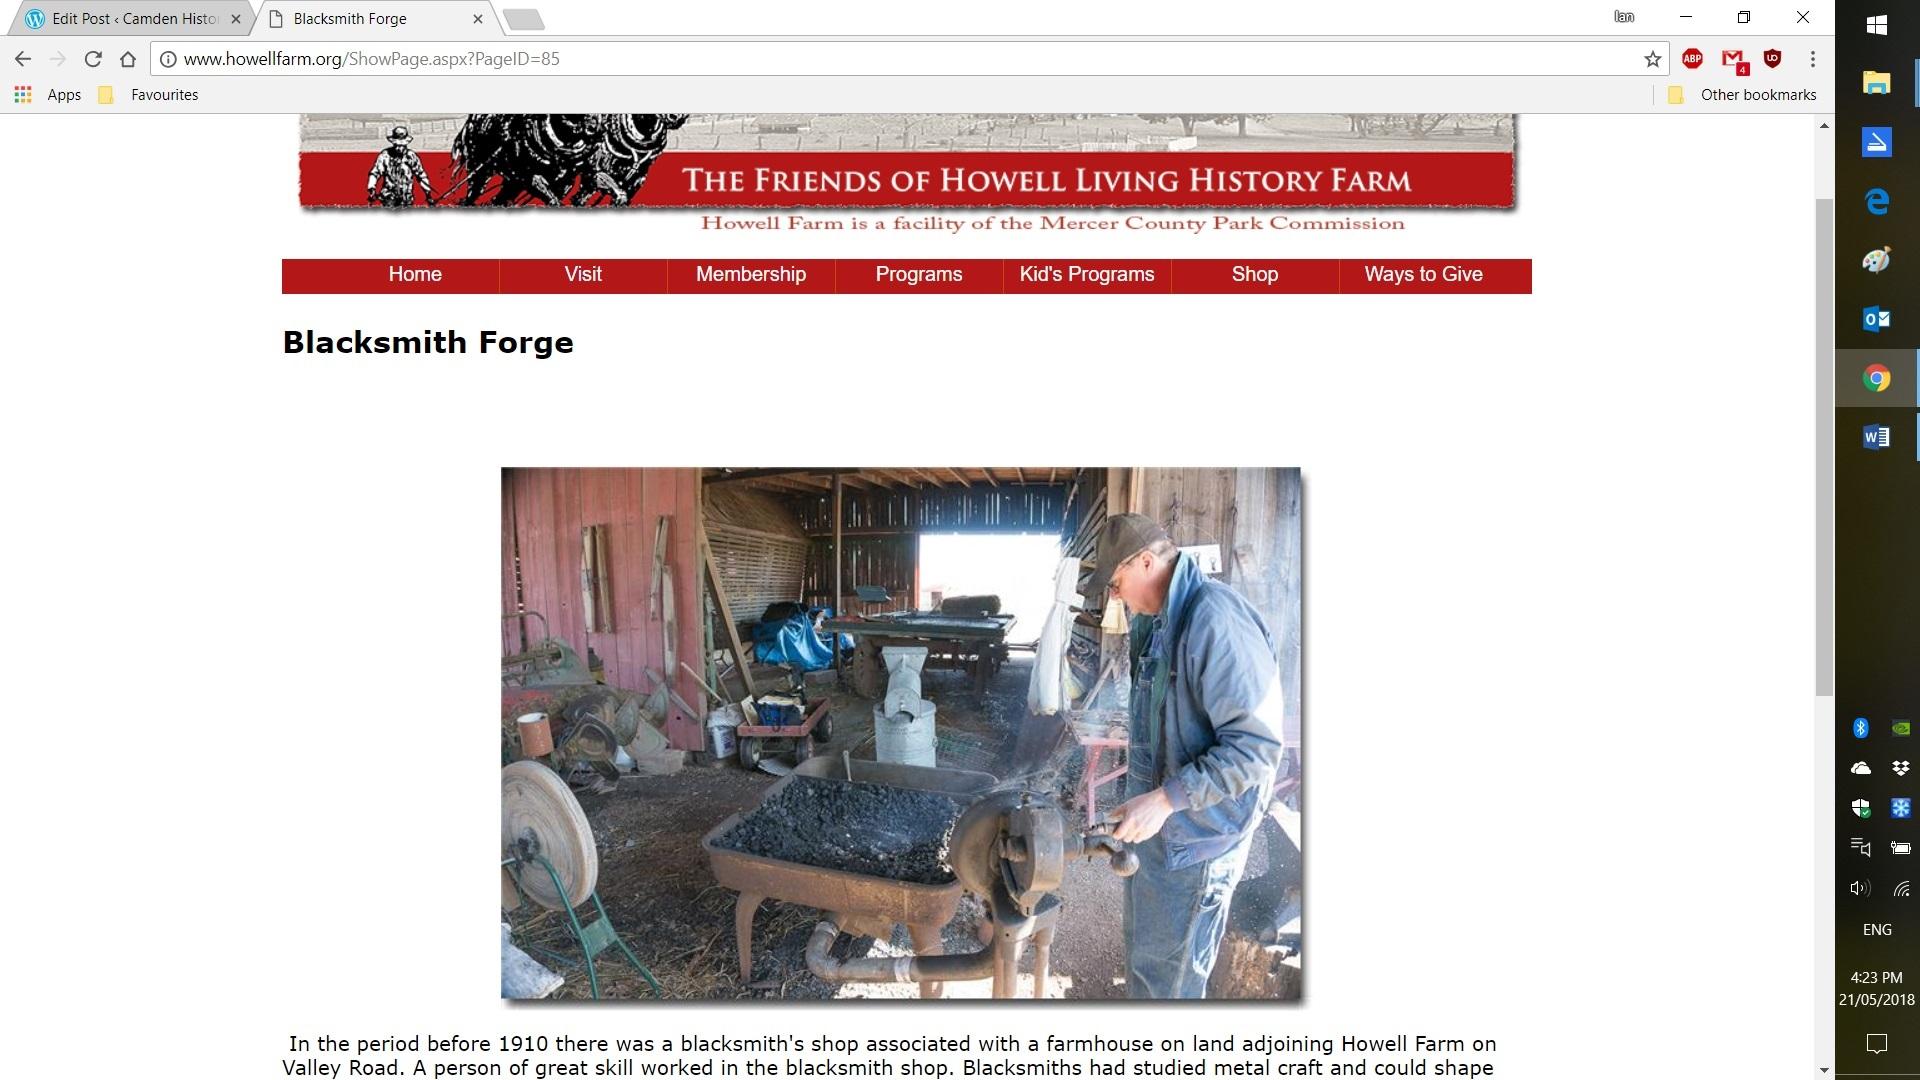 Howell Farm ScreenShot 2018 blacksmithing